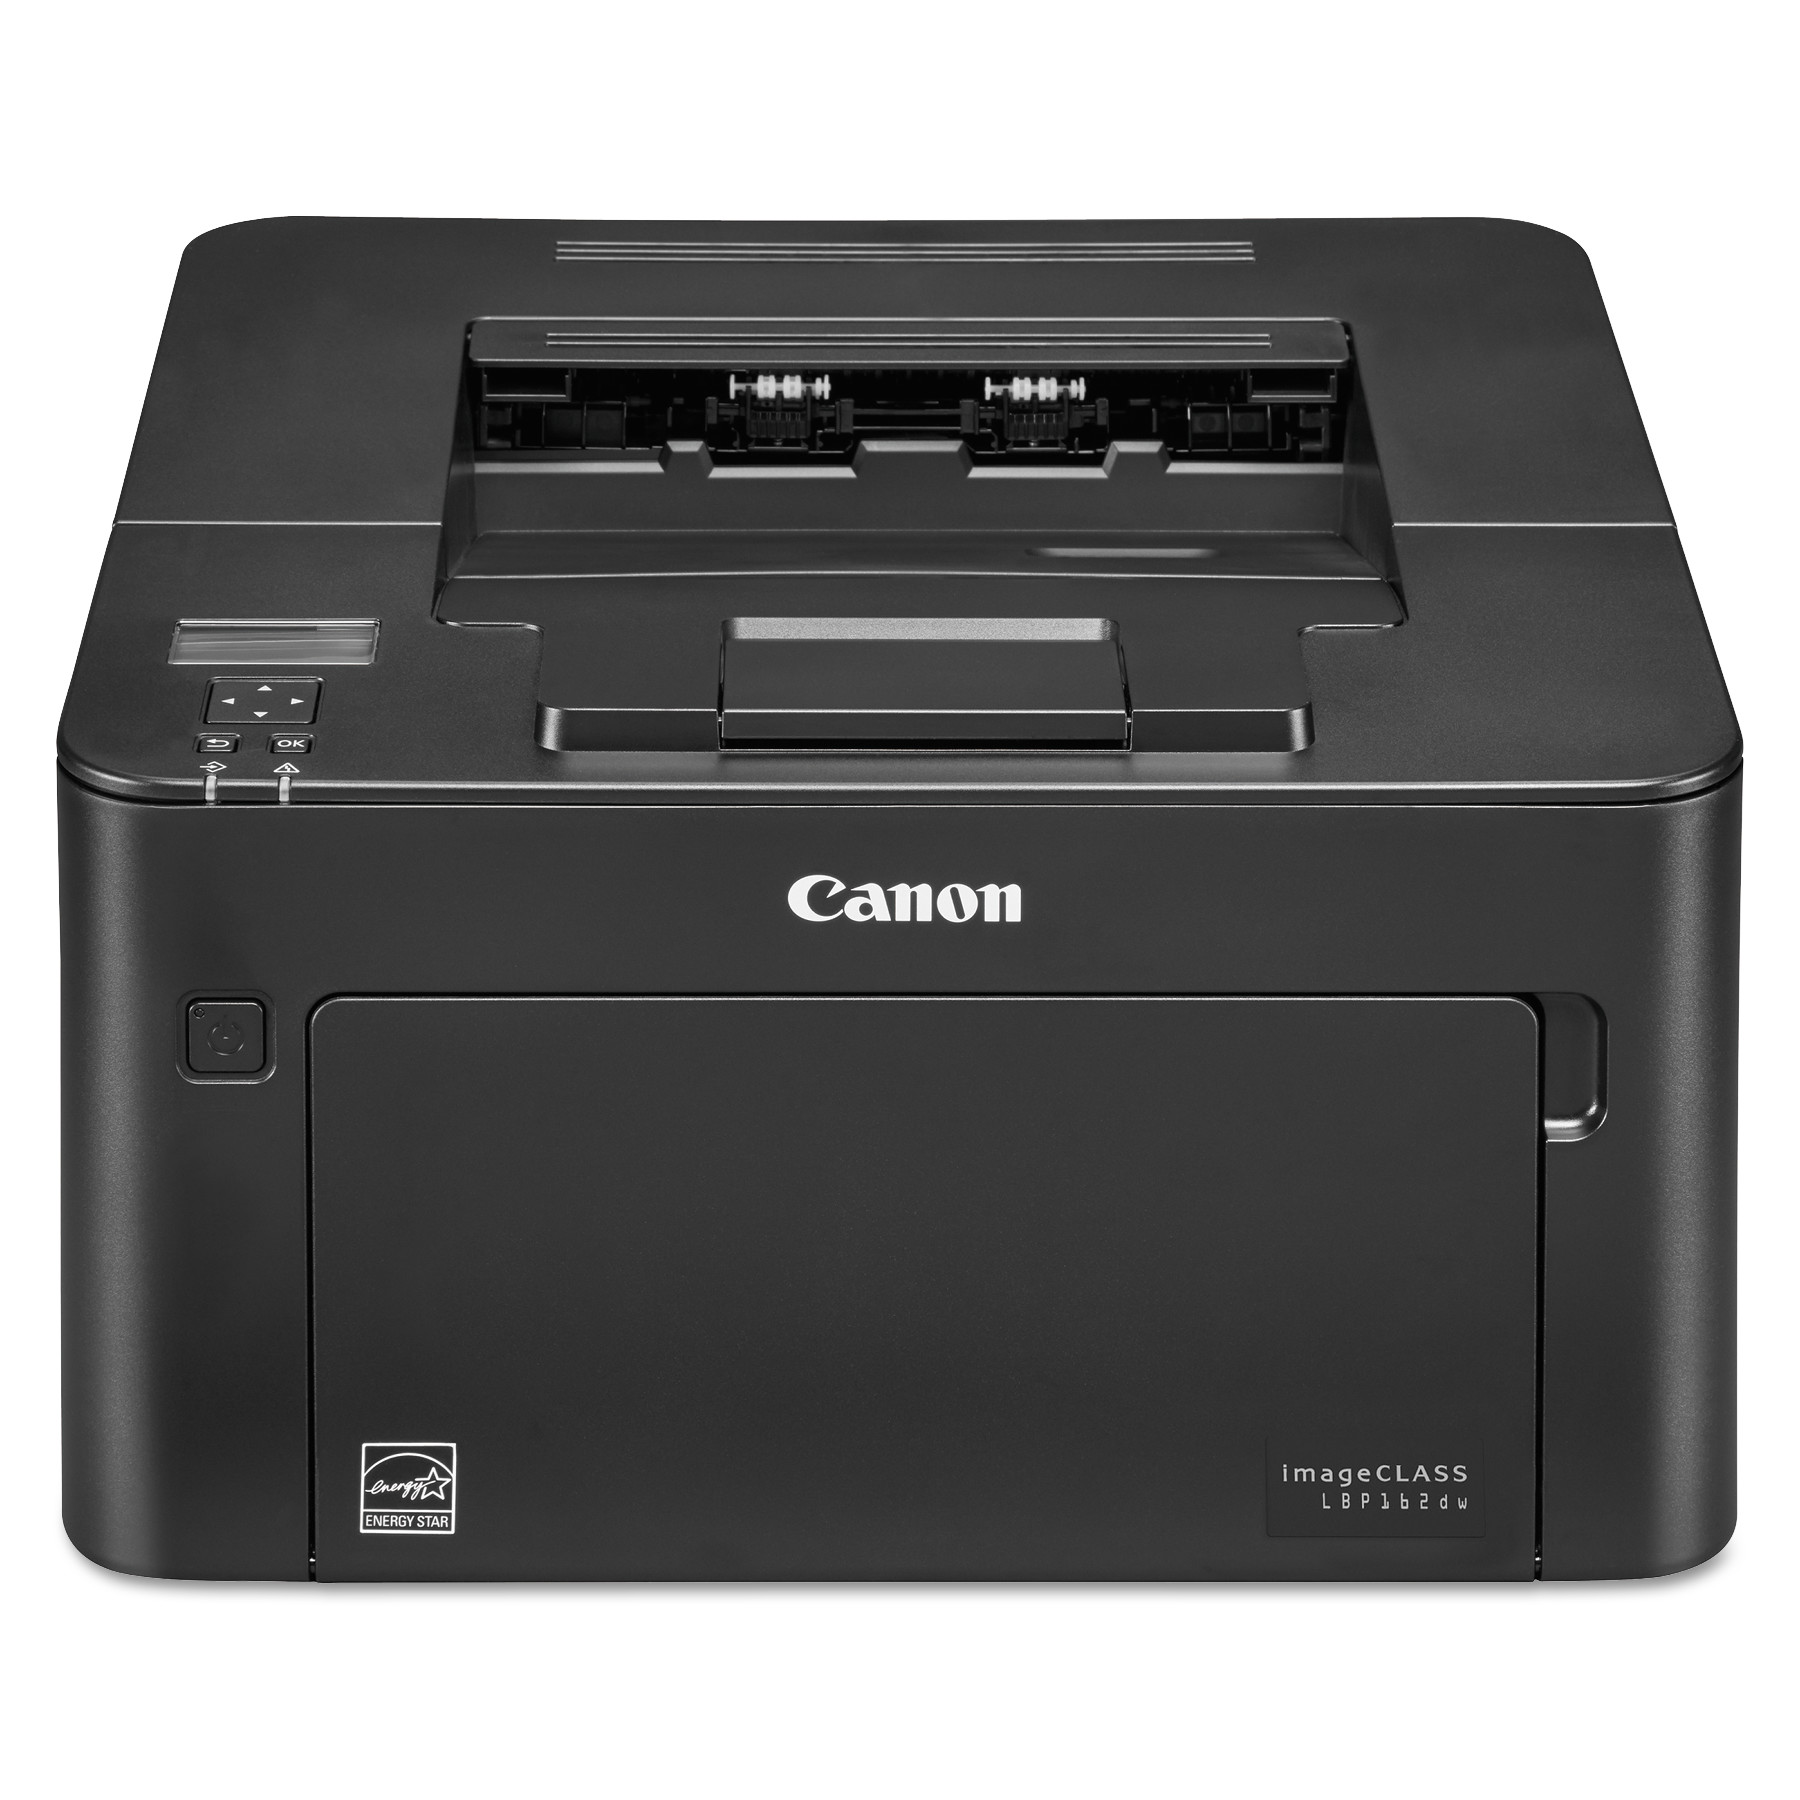 ImageCLASS LBP162dw Wireless Laser Printer